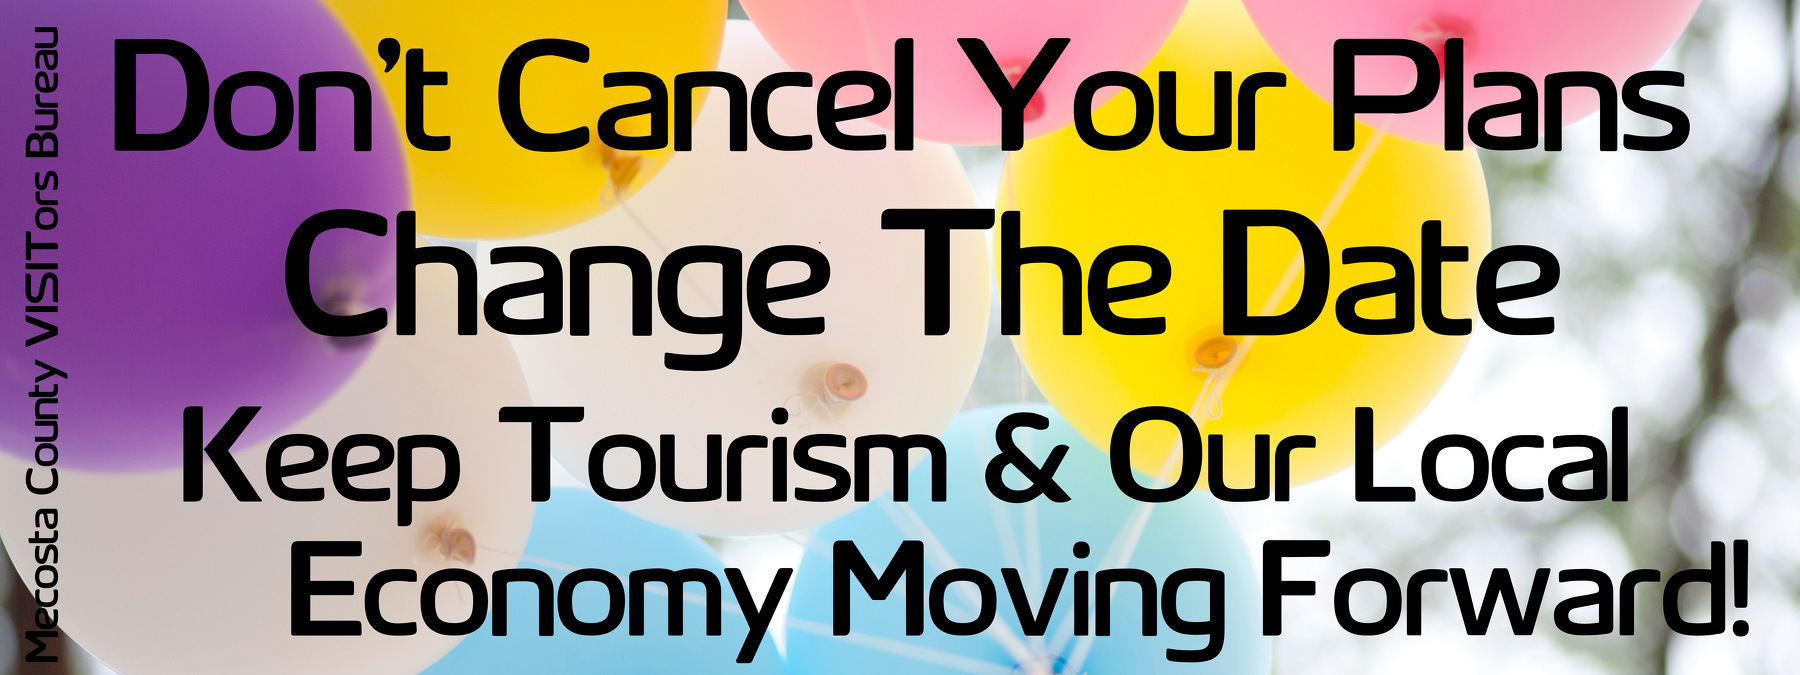 tourism-sign.jpg